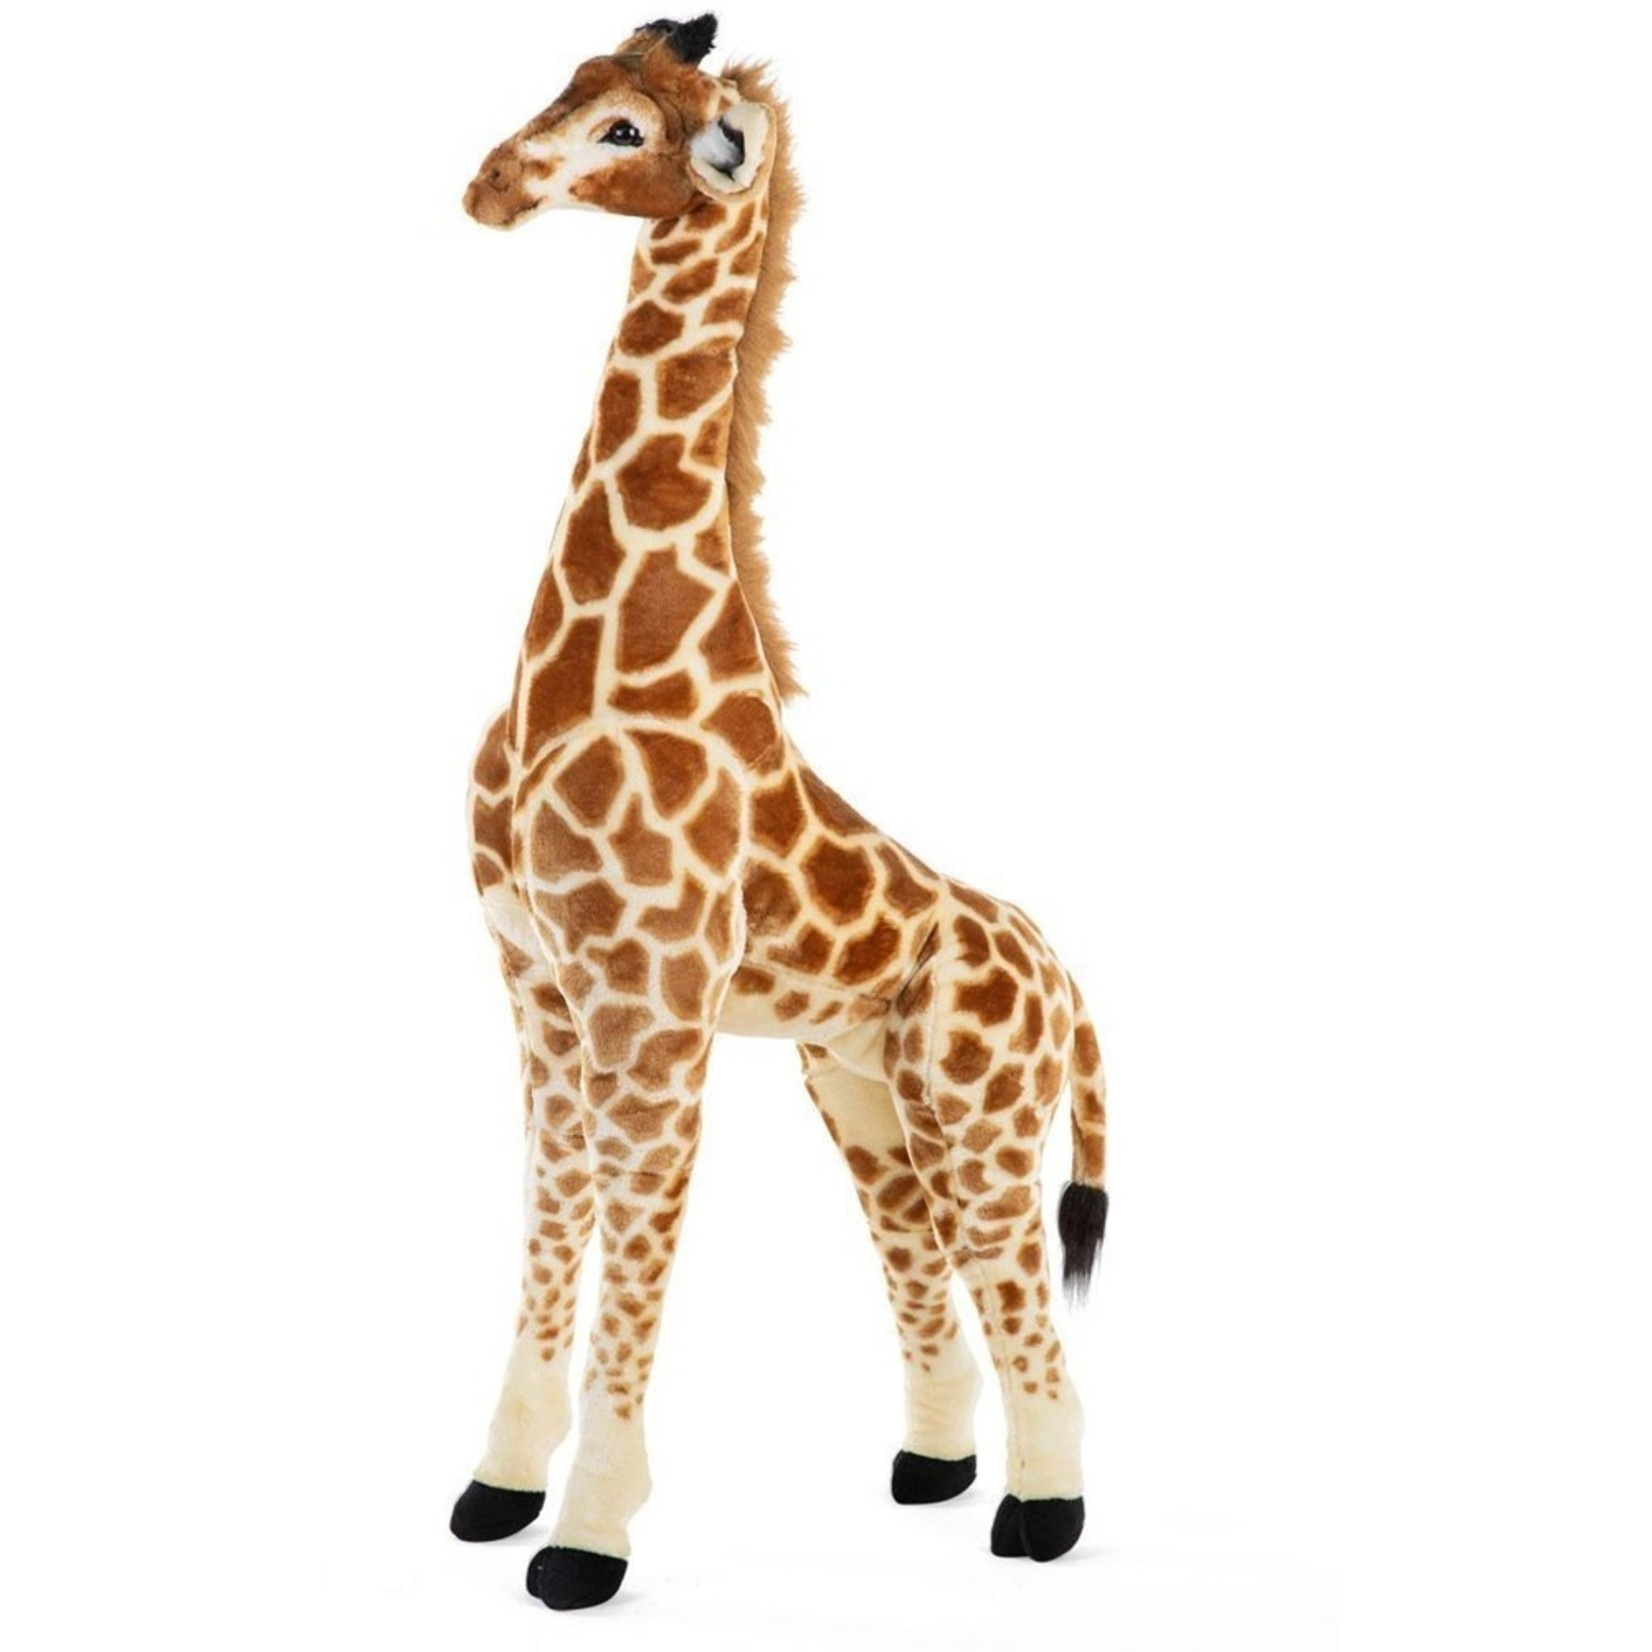 Childhome Childhome Giraf Staand 135cm